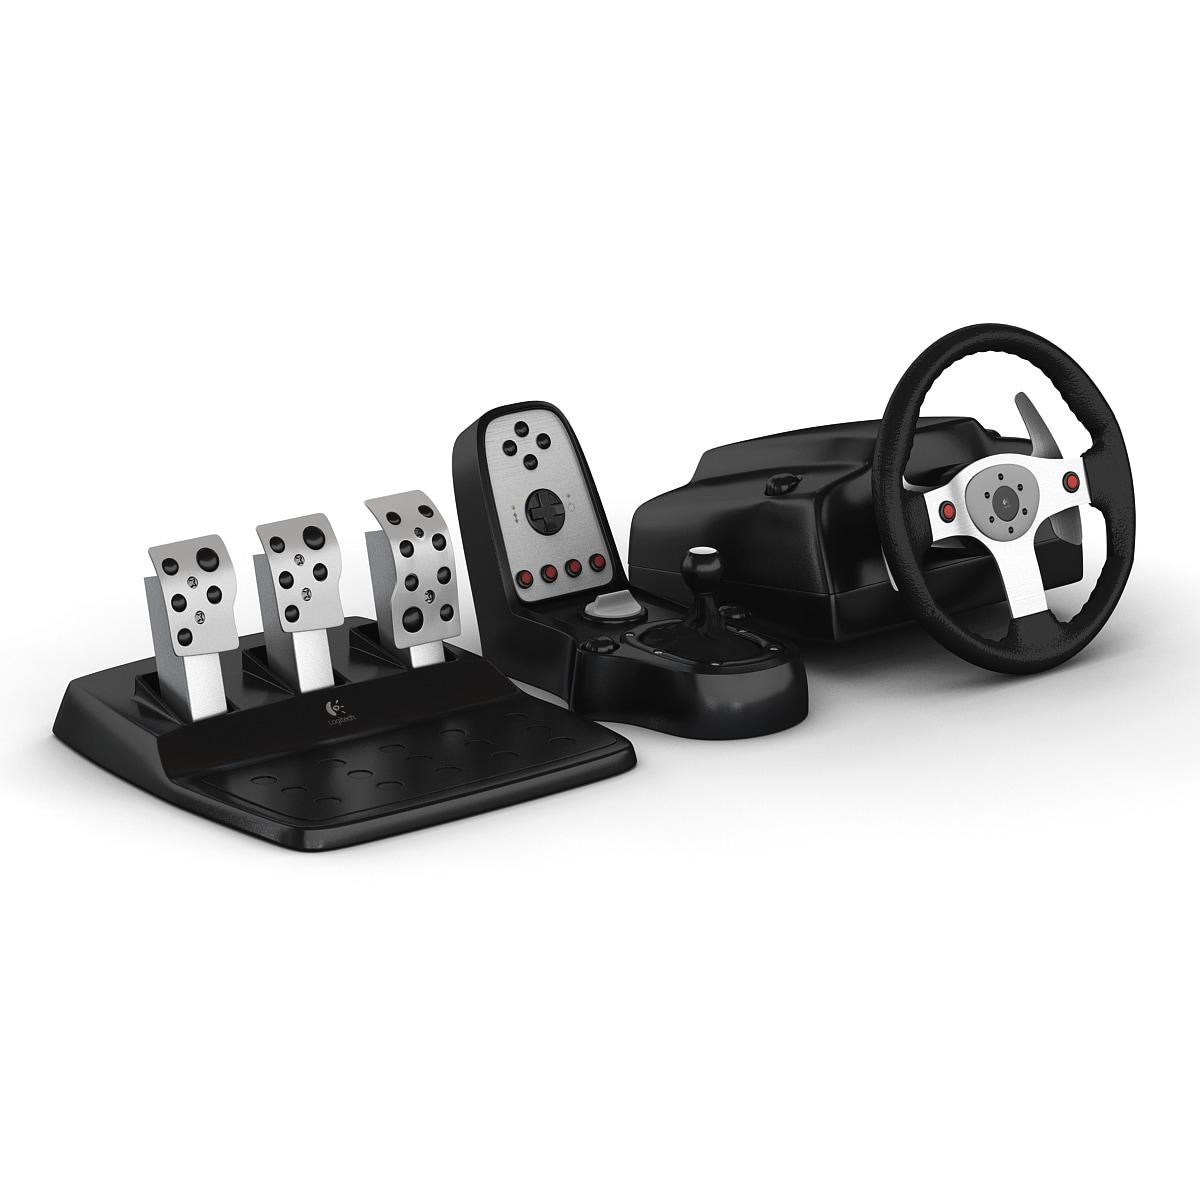 Logitech_G25_Racing_Wheel_001.jpg